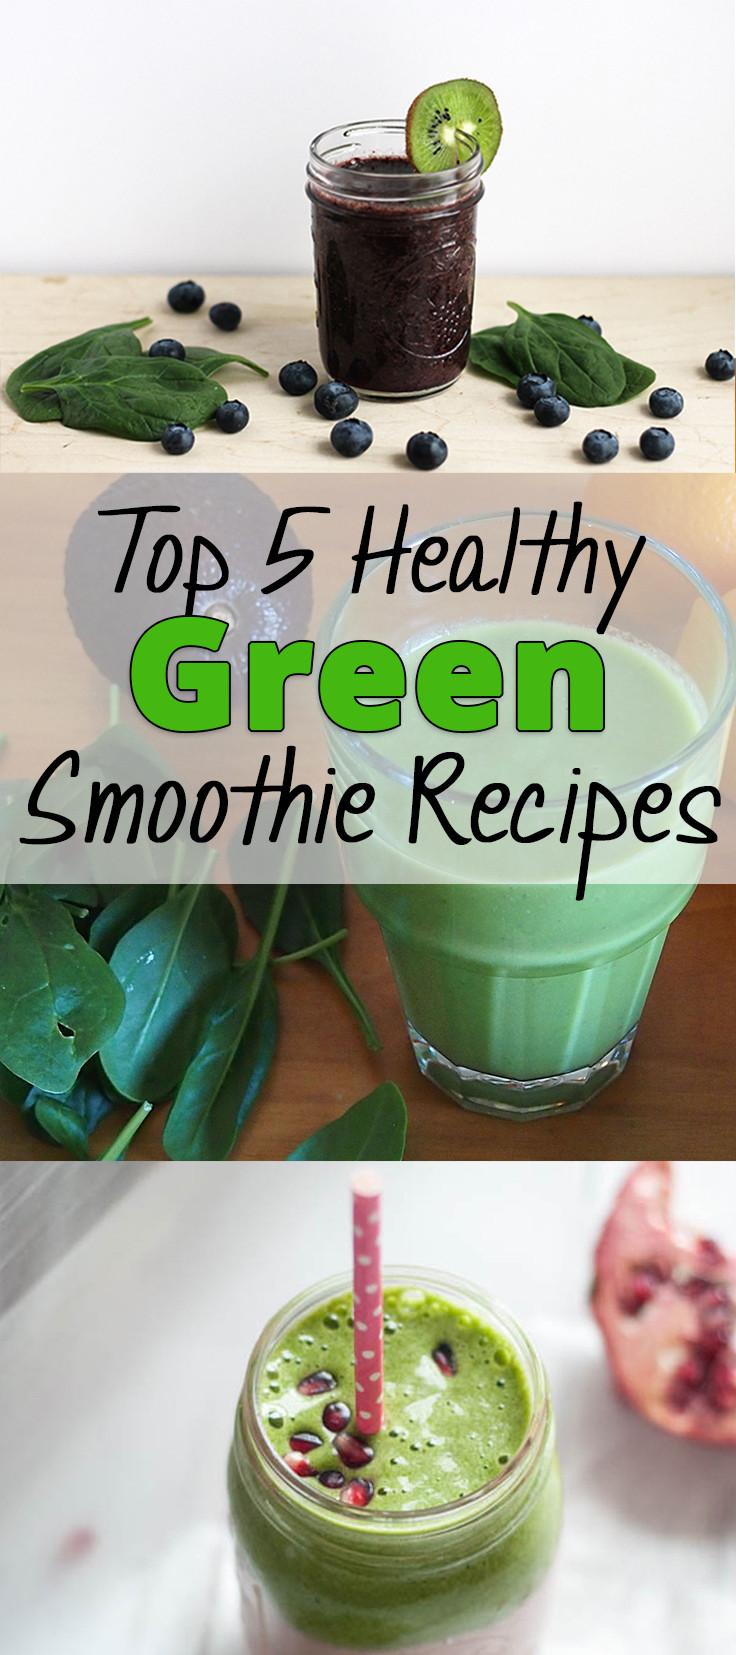 Healthy Green Smoothie Recipes  Top 5 Healthy Green Smoothie Recipes